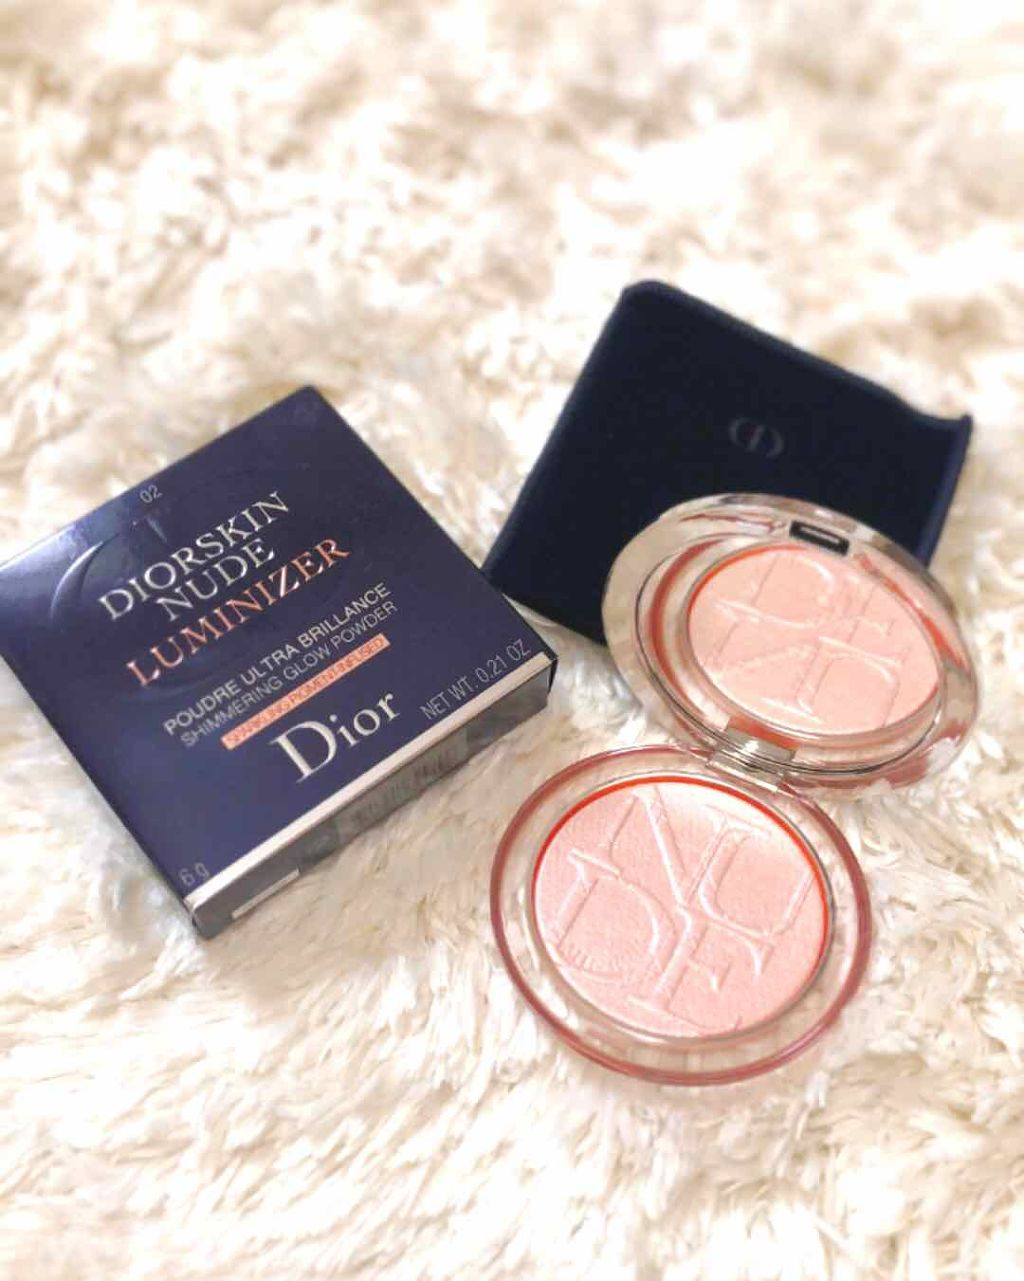 best service 834b8 44a70 ディオールスキン ミネラル ヌード ルミナイザー パウダー|Dior ...